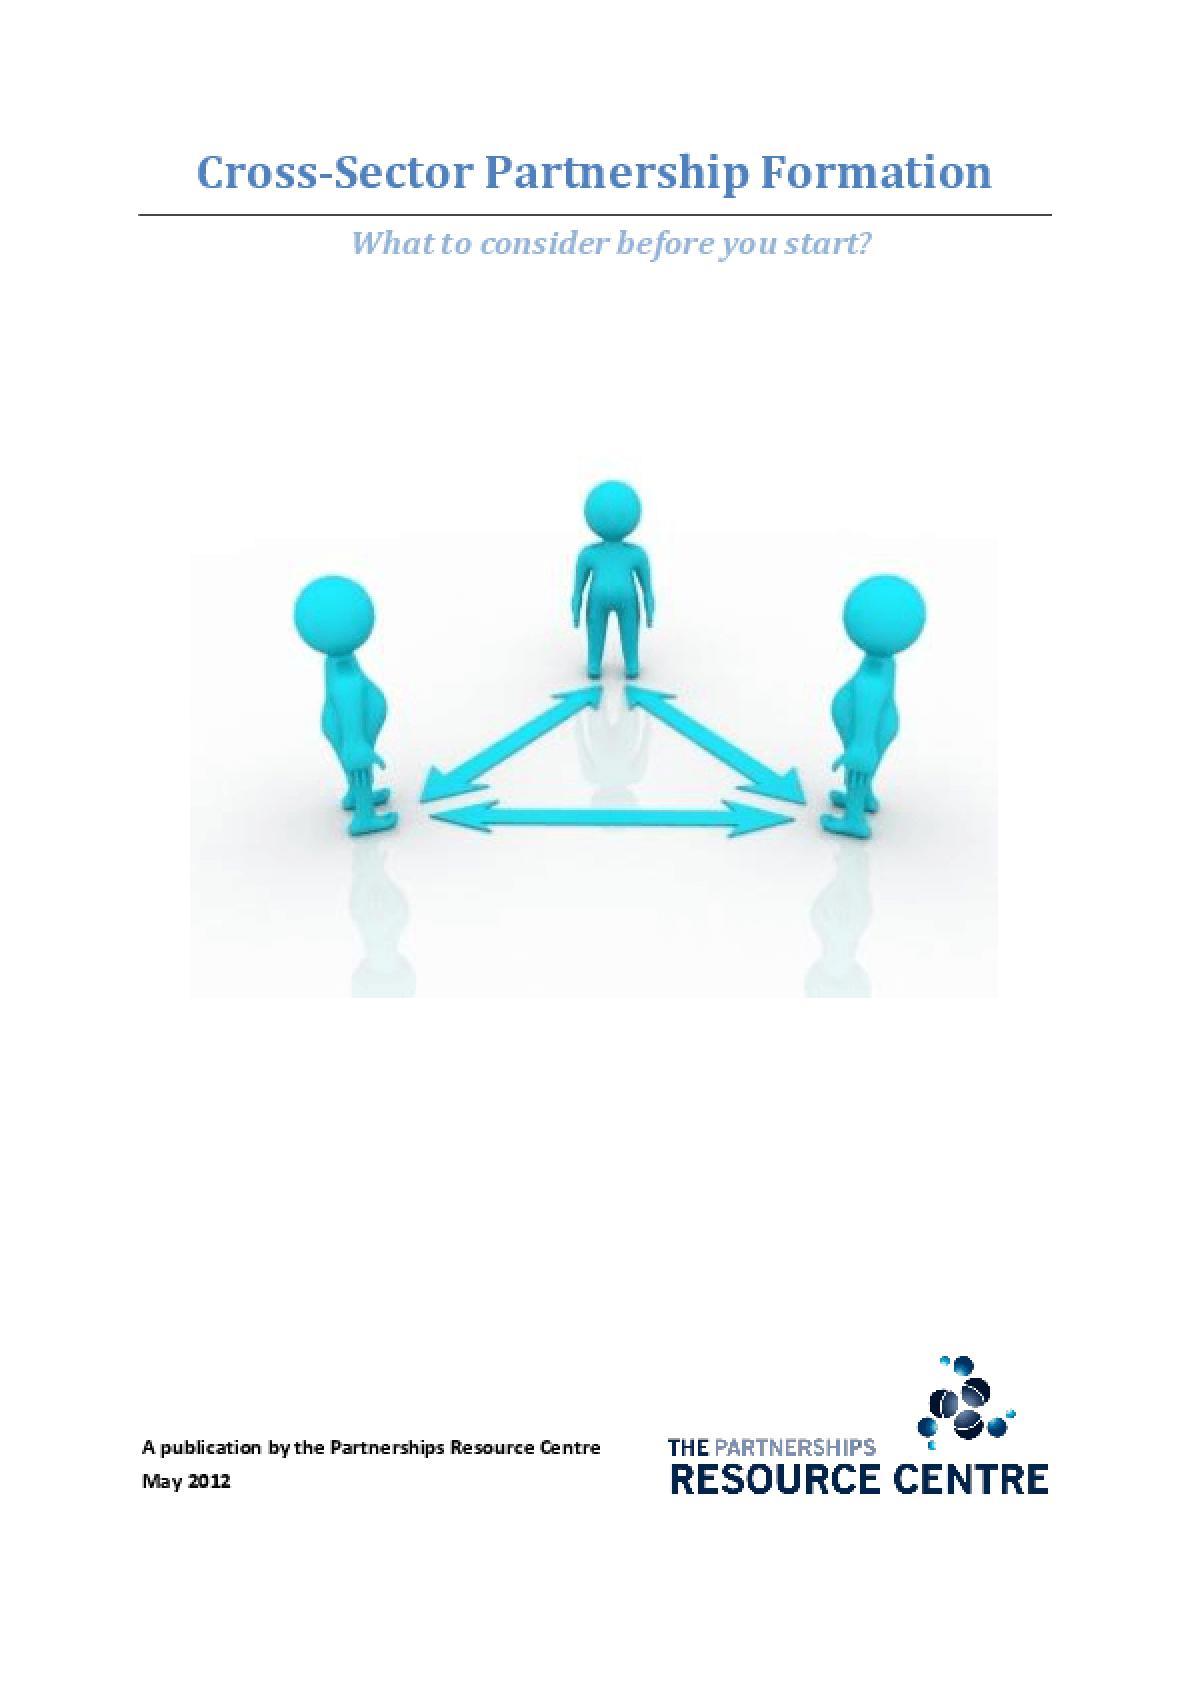 Cross-Sector Partnership Formation